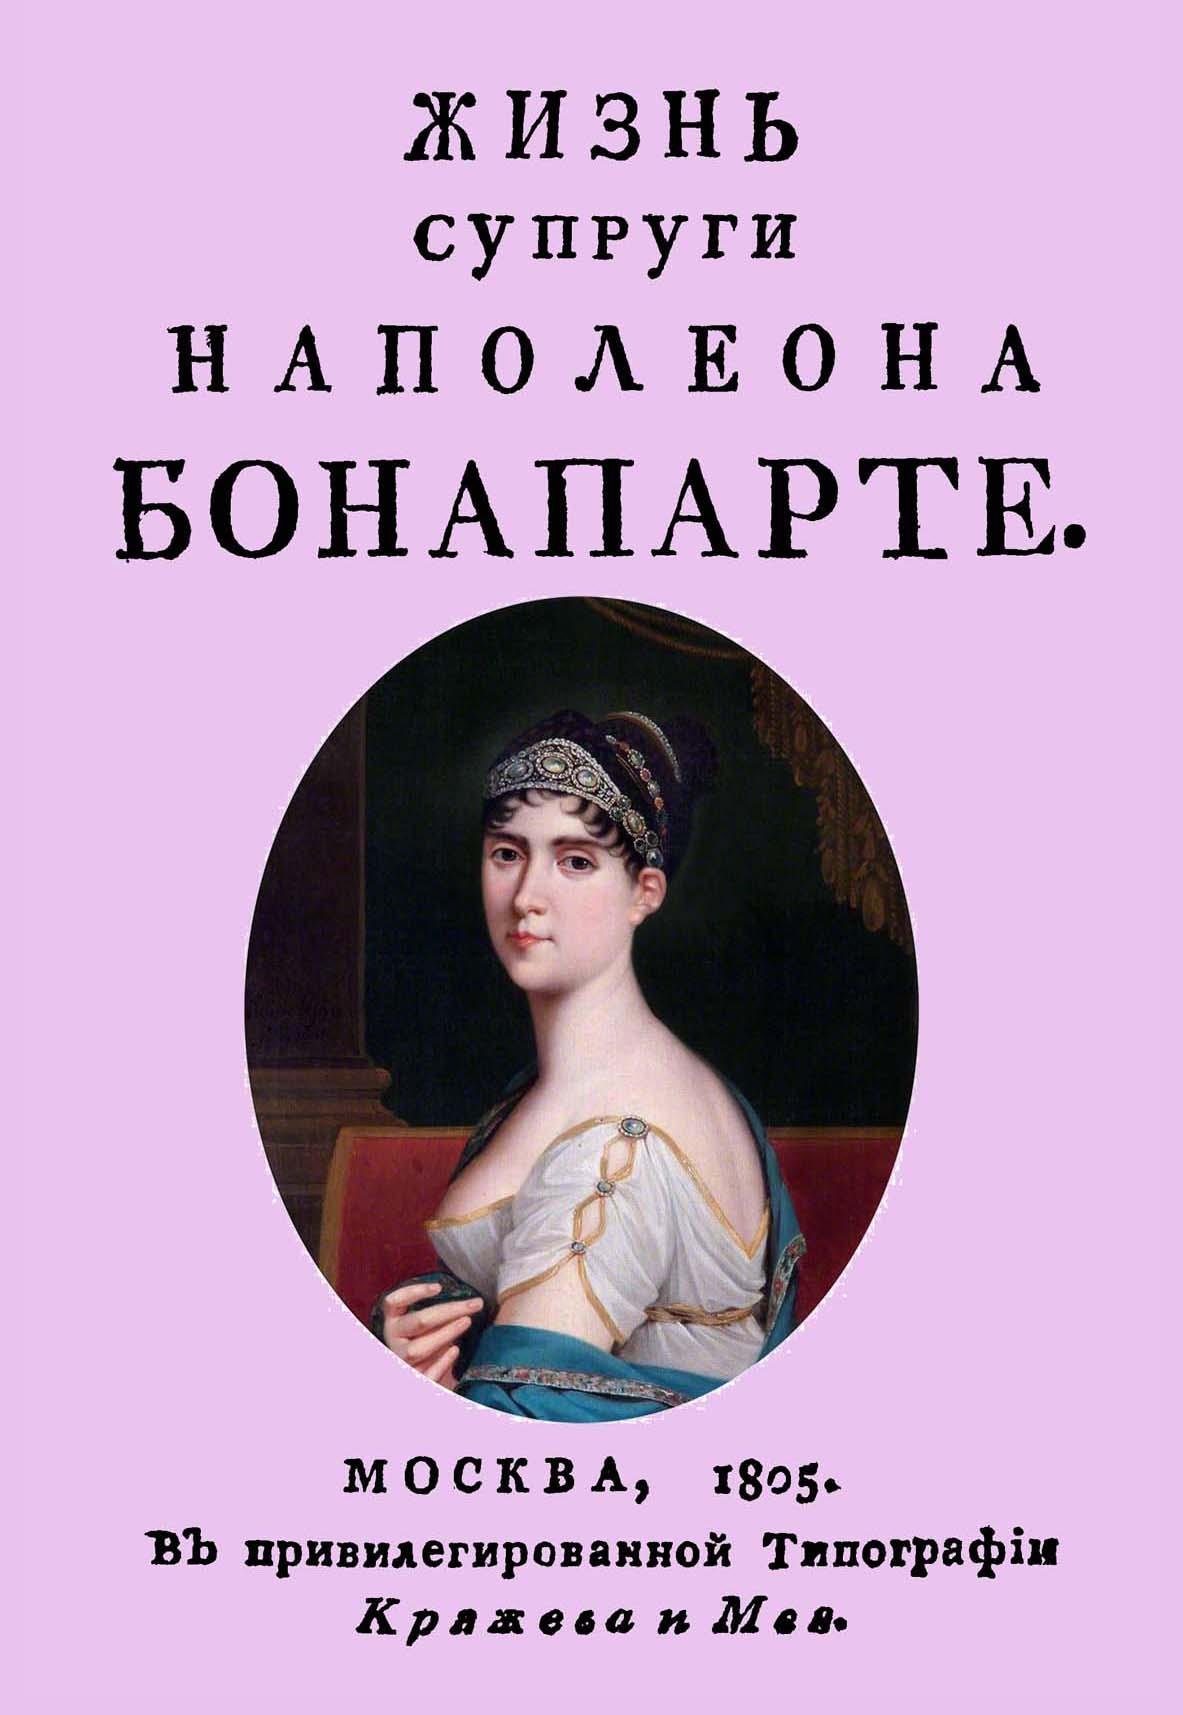 Жизнь супруги Наполеона Бонапарте камилла де ла бедуайер луис комфорт тиффани лучшие произведения